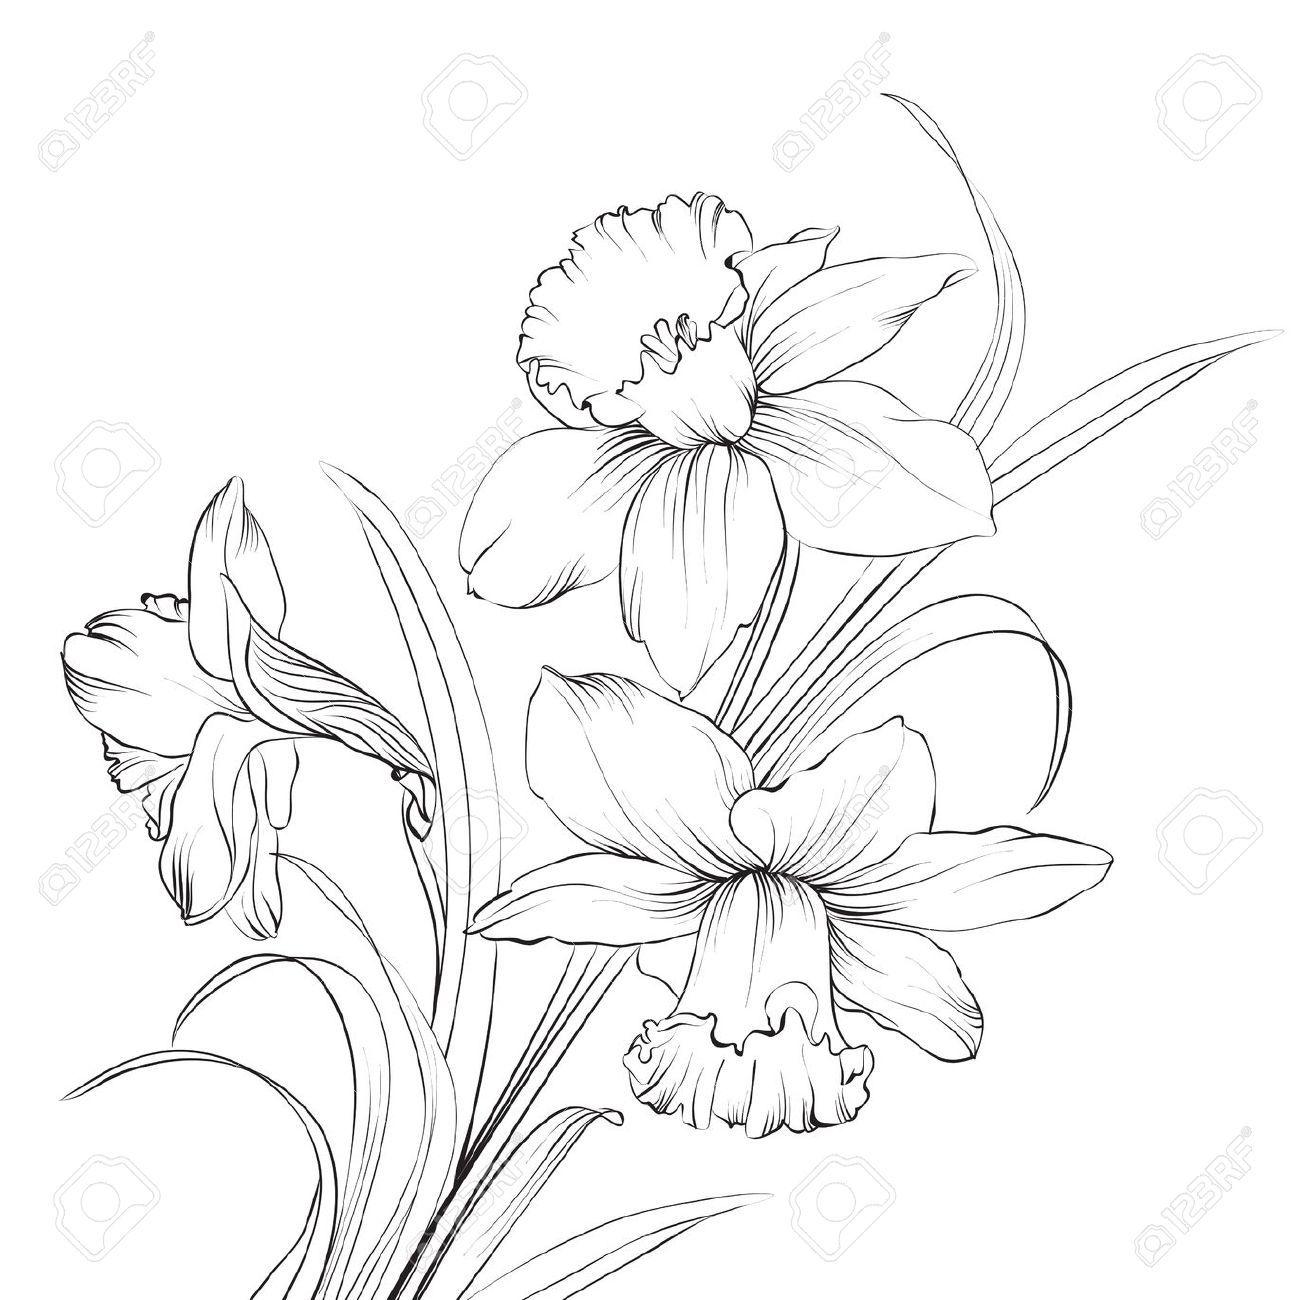 Narzissenblume oder narzissen isoliert auf weiß abbildung déssins